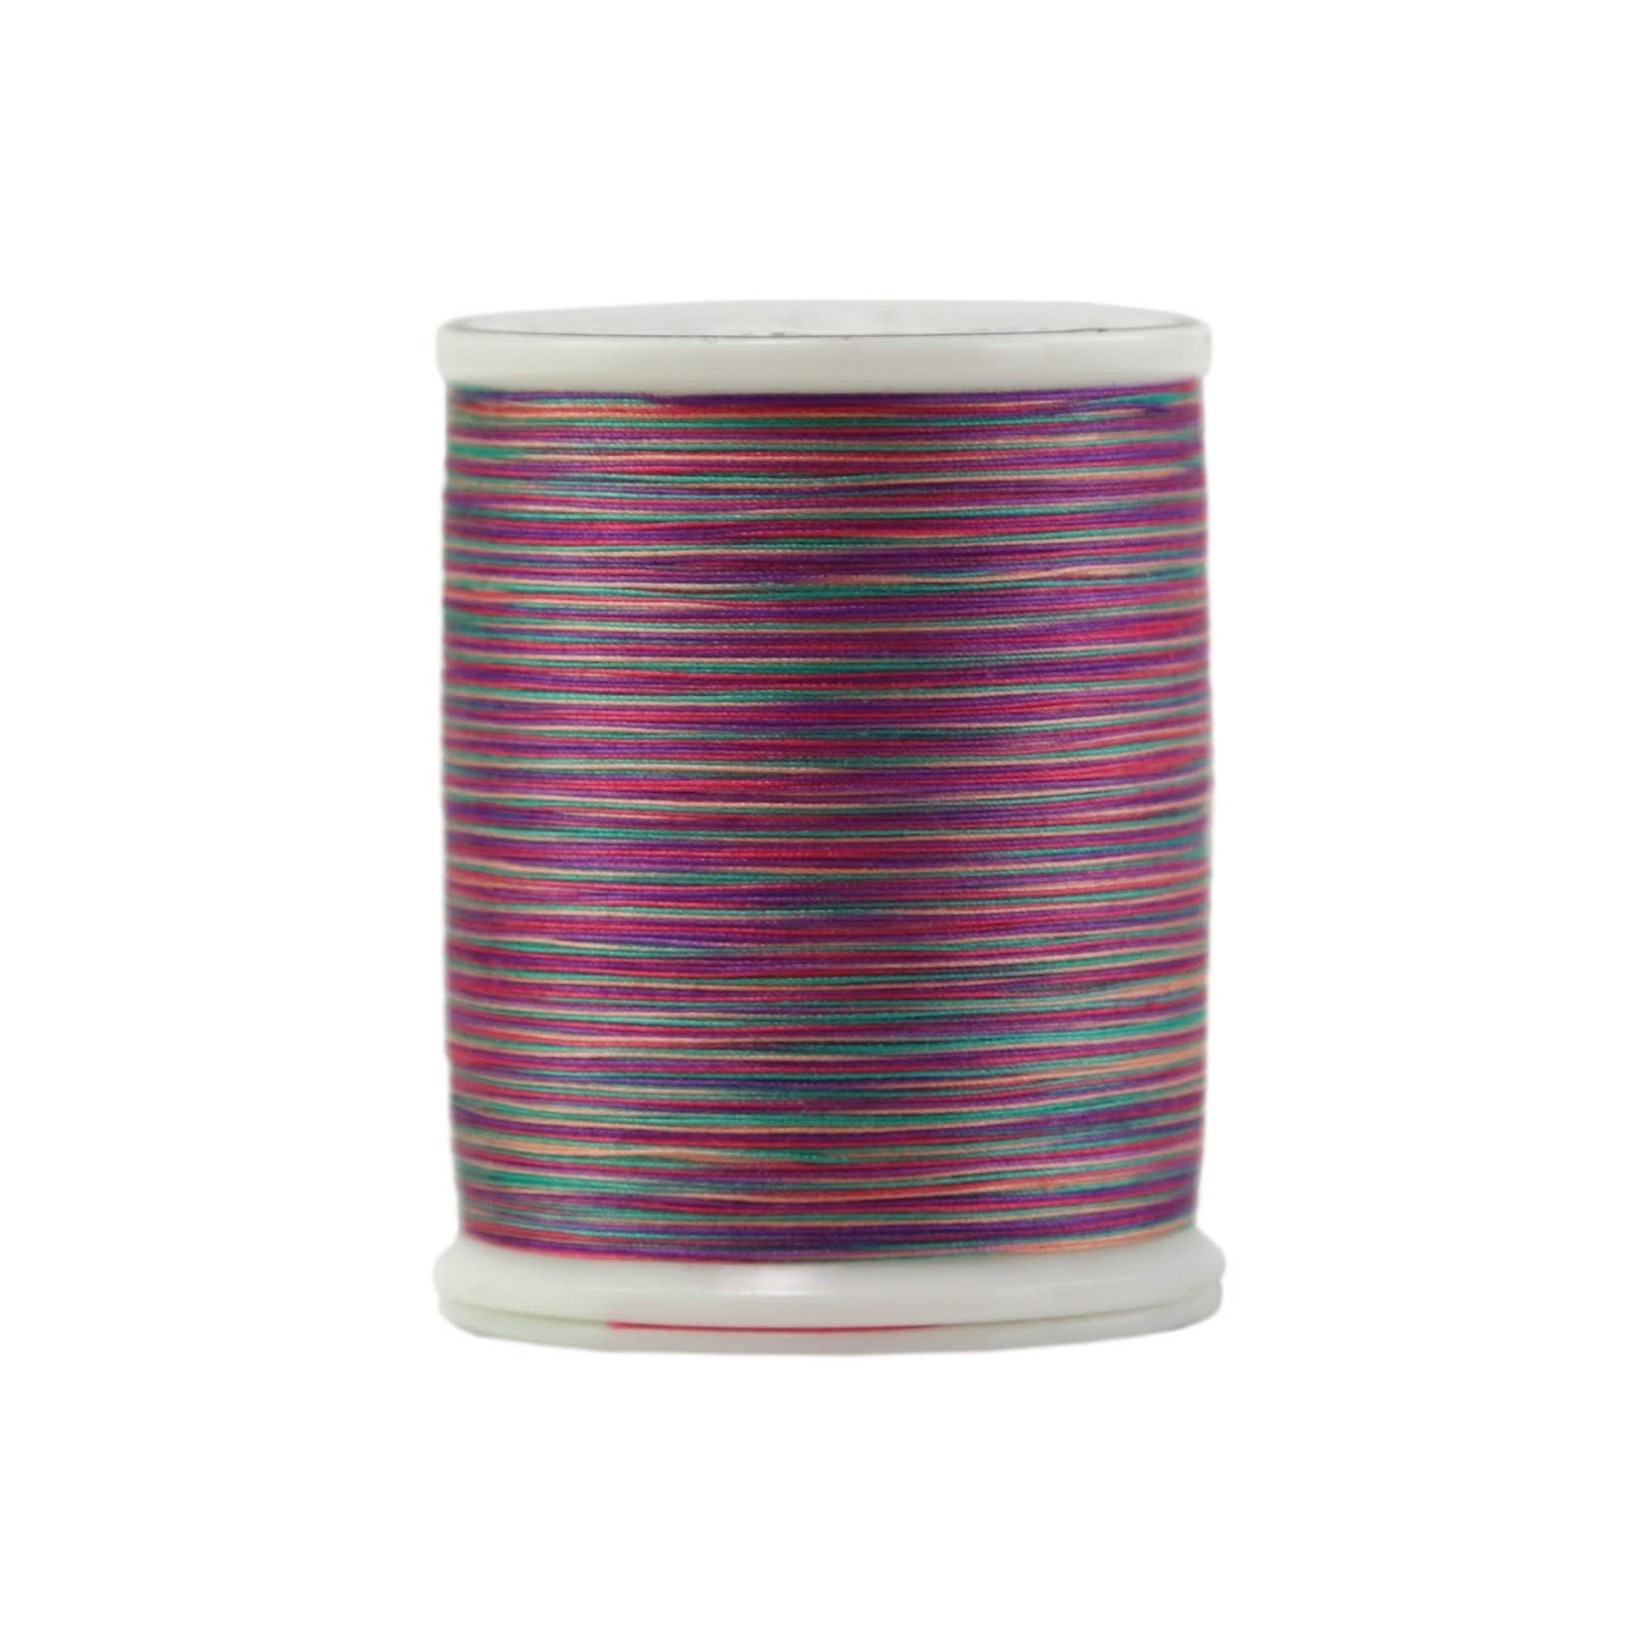 Superior Threads King Tut - #40 - 457 m - 1060 Splendid